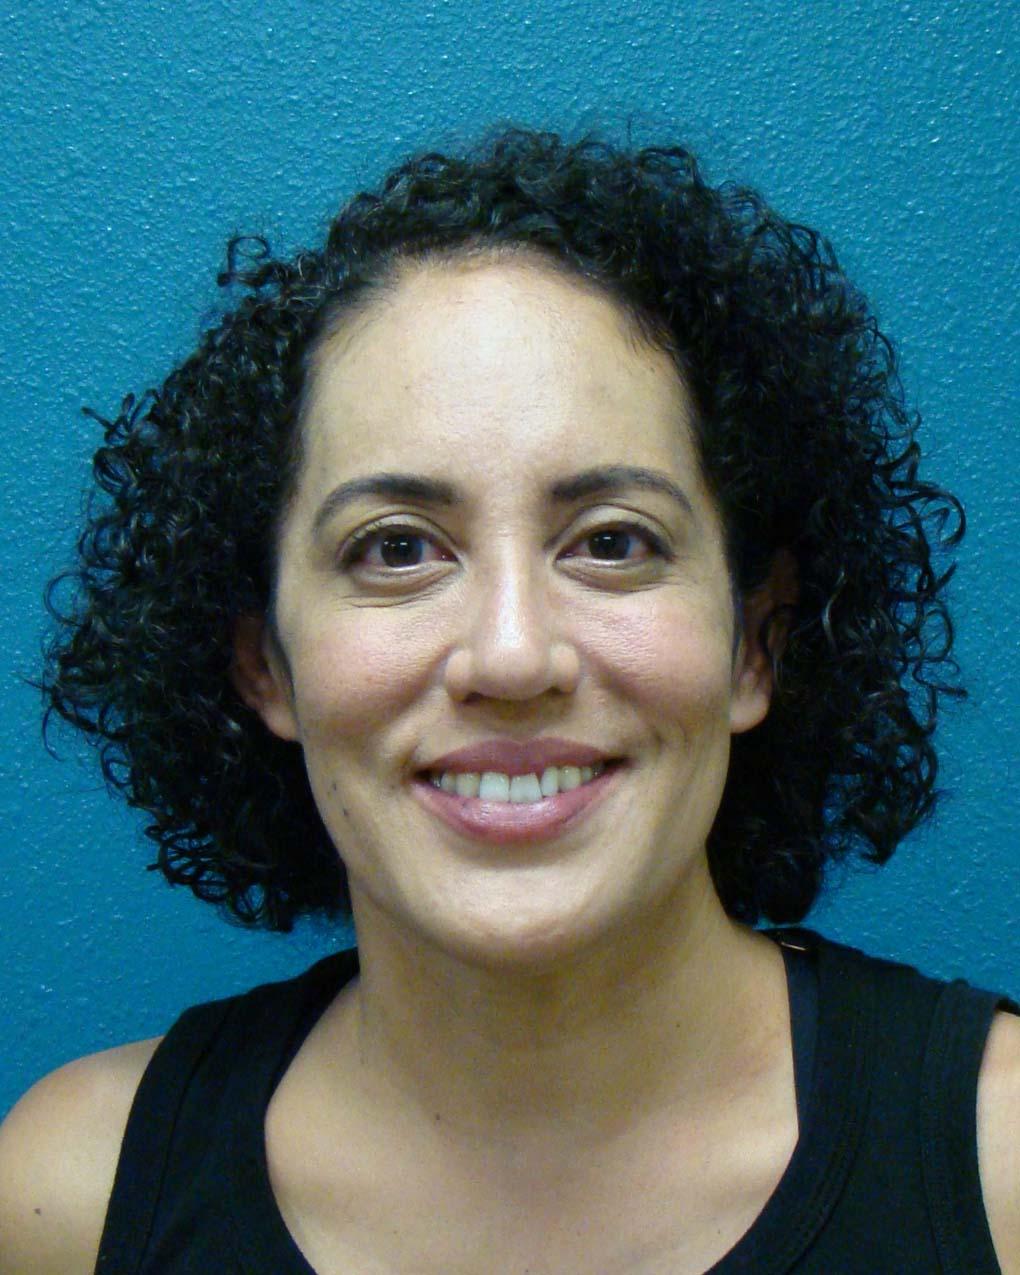 Kopfschuss Christina Sanchez Quinata.